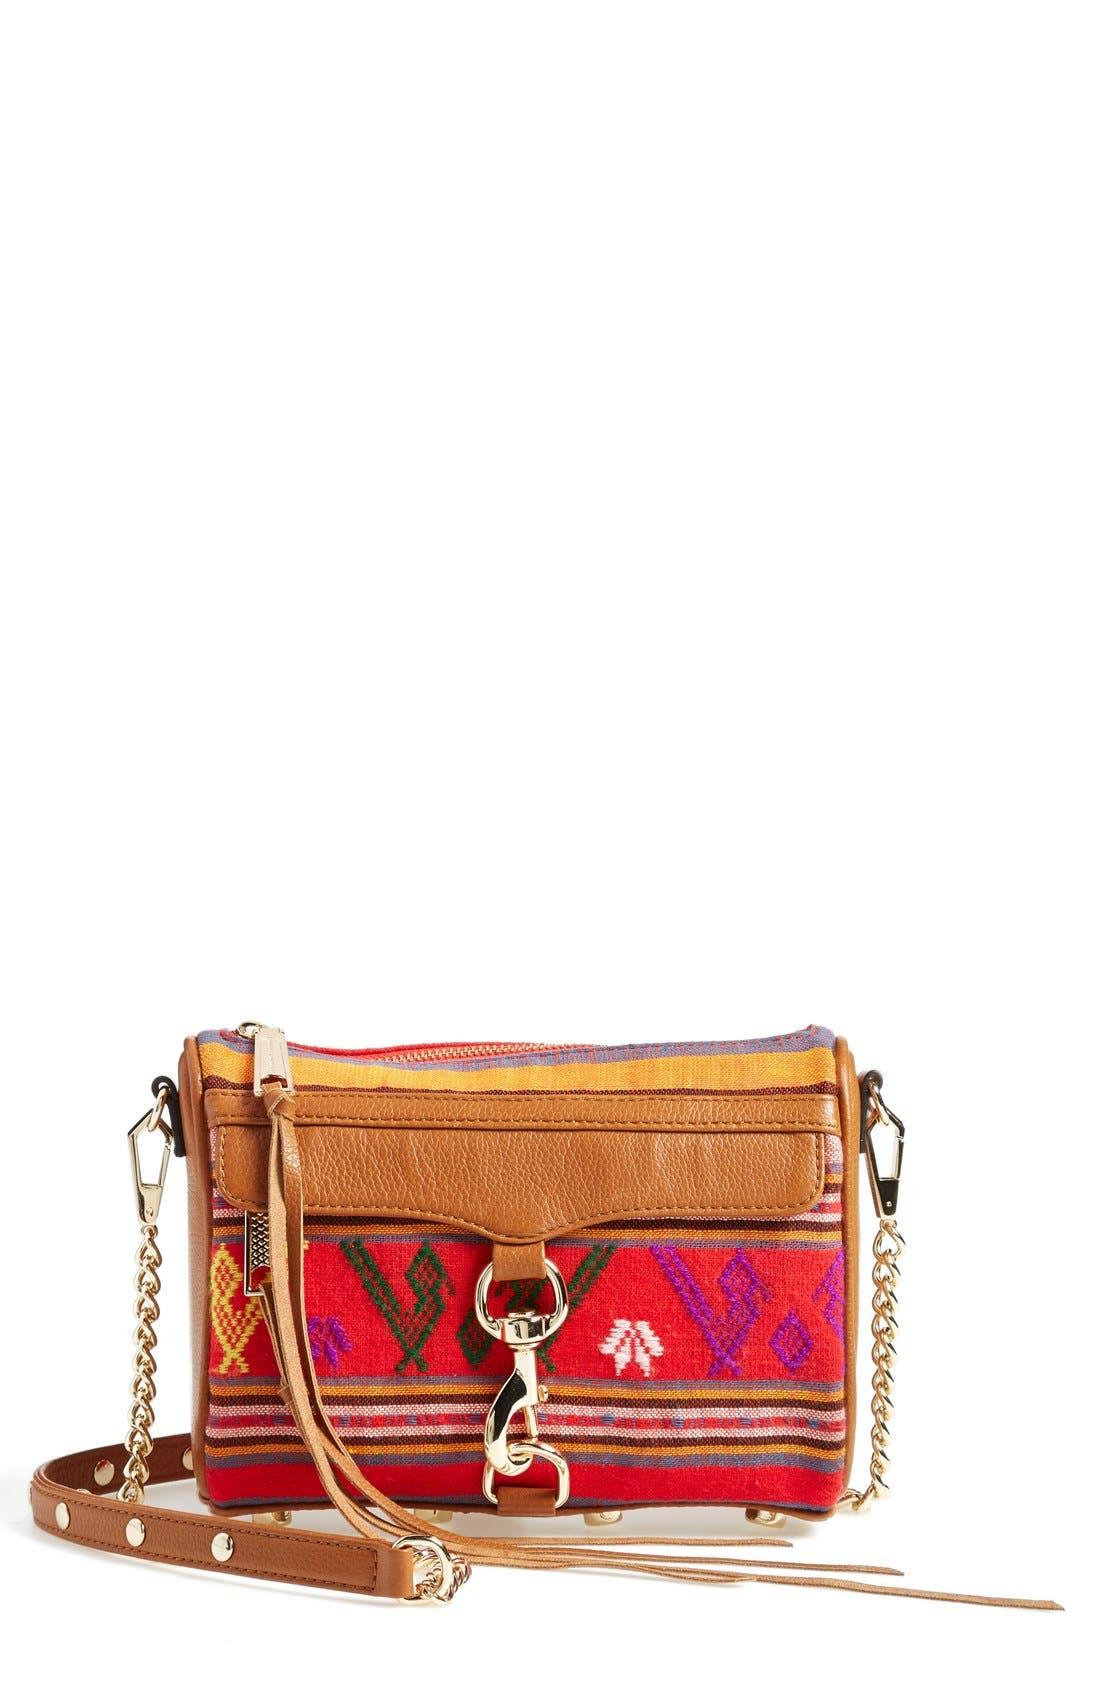 Piece & Co. and Rebecca Minkoff 'Mini MAC' Convertible Crossbody Bag,                             Main thumbnail 1, color,                             800